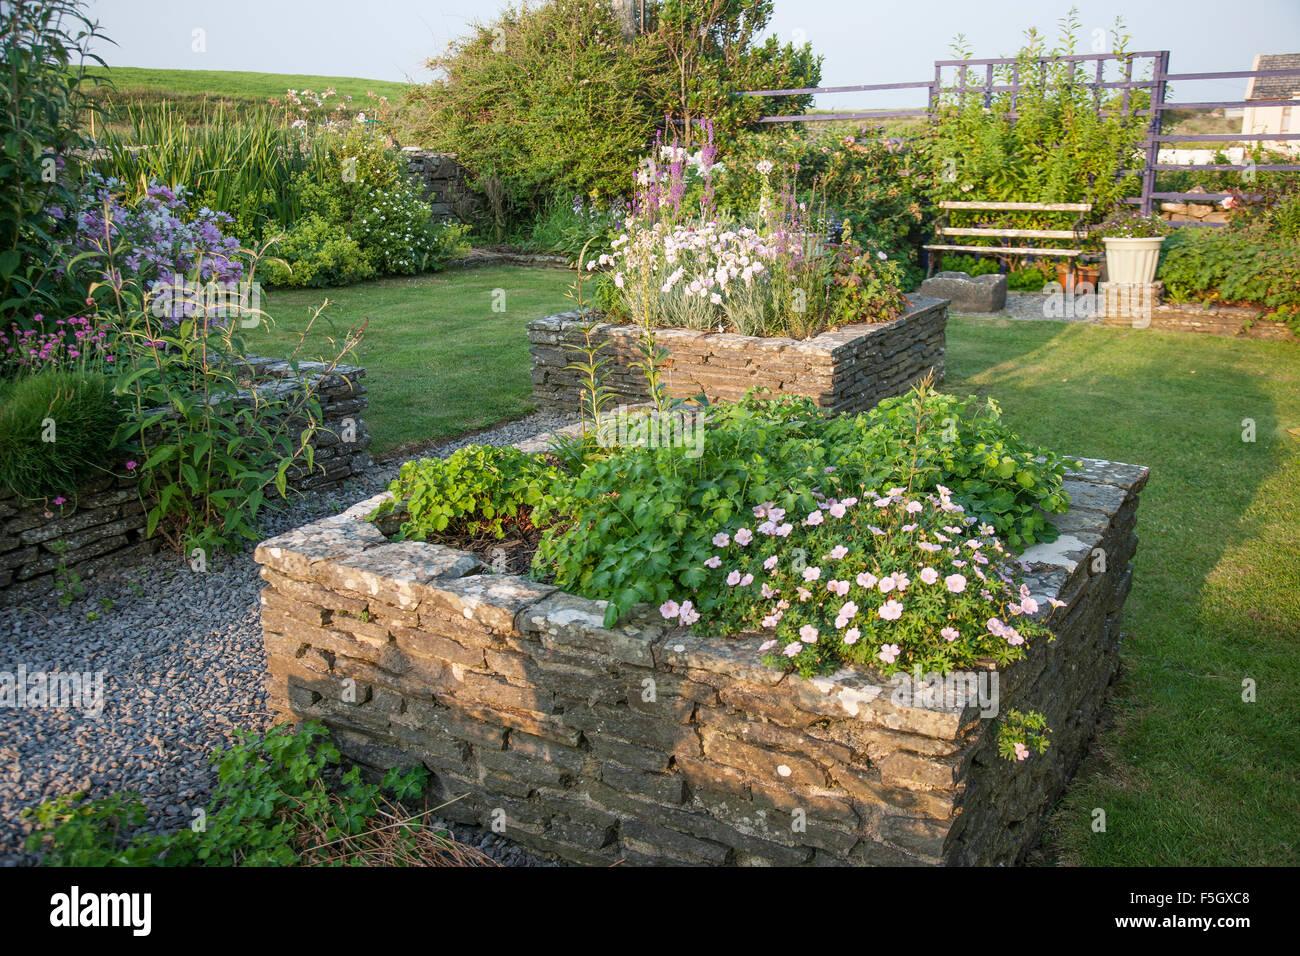 Image of: Raised Flower Beds With Stone Borders Ireland Stock Photo Alamy